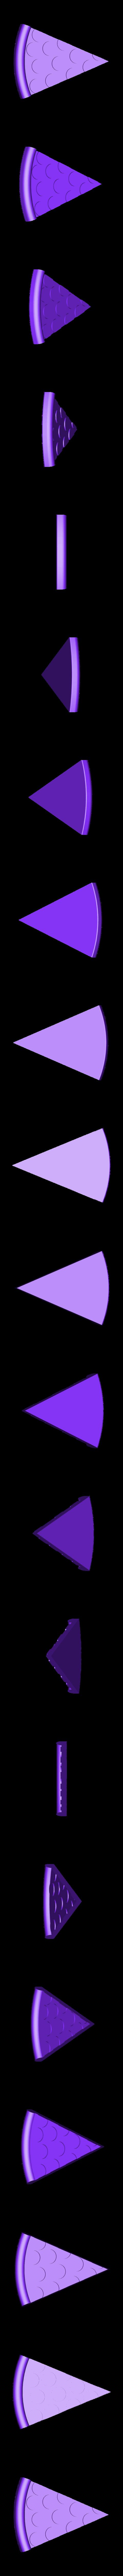 Pizza (1).stl Download STL file Simple Pizza • 3D printer object, jaewon